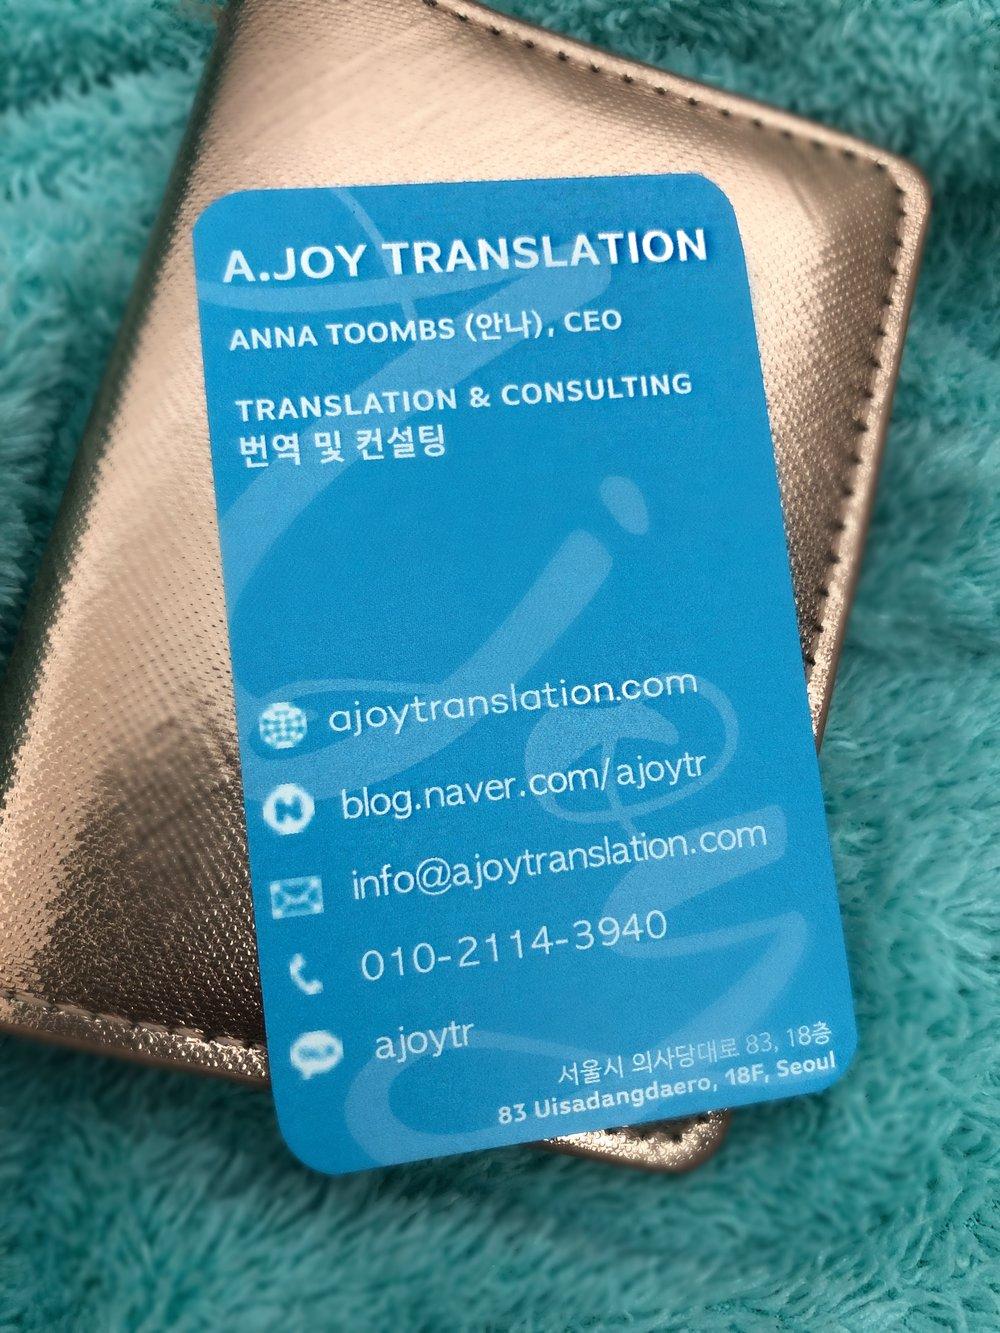 AJoyTranslation business card.JPG